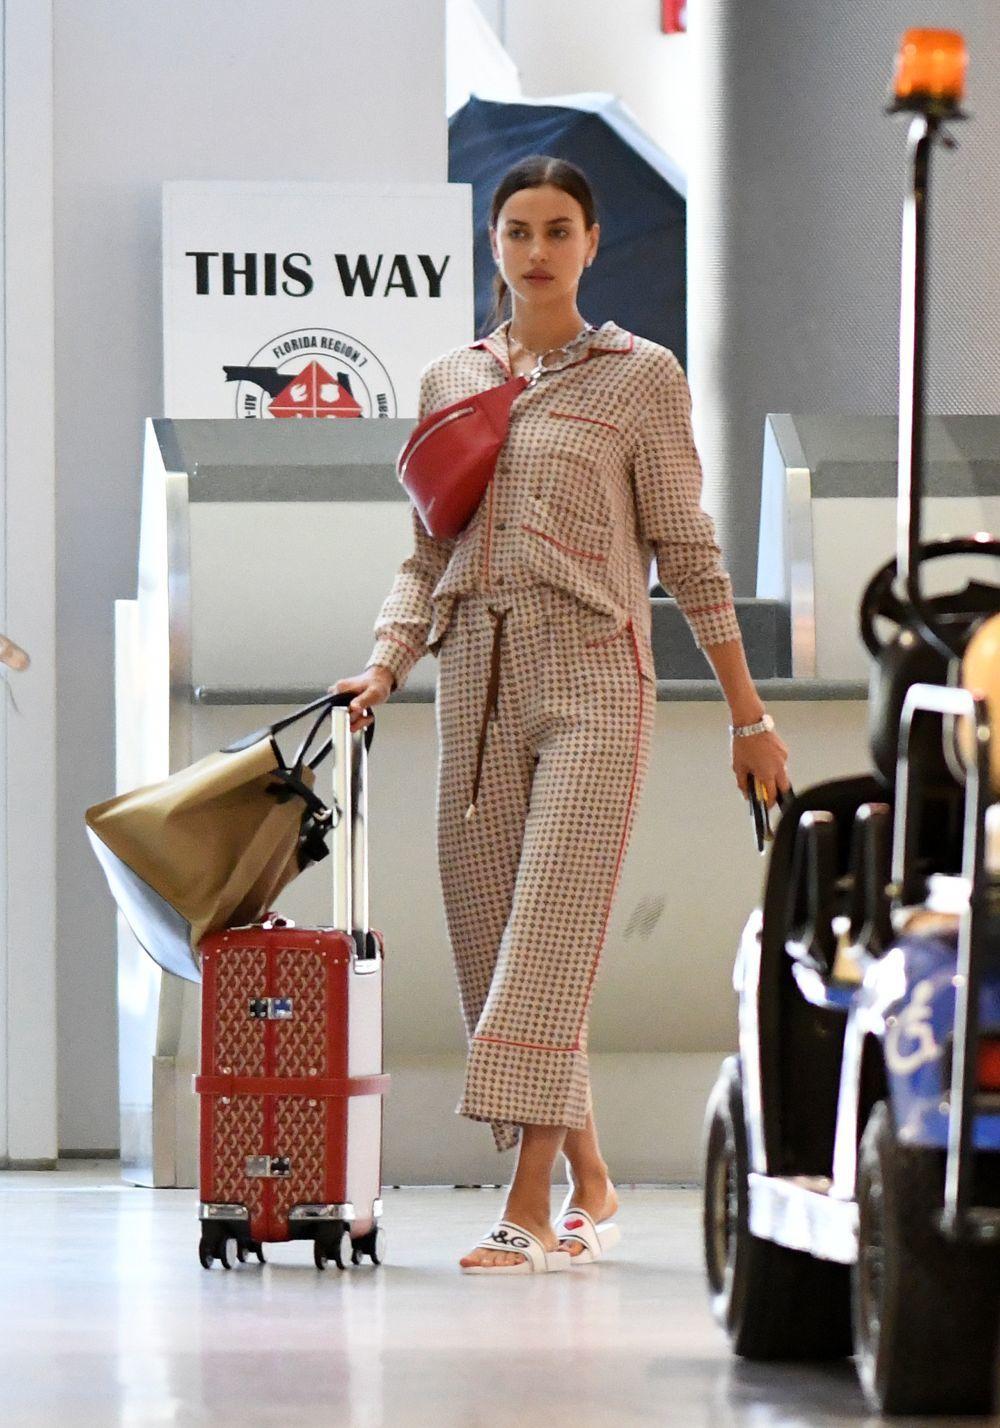 La modelo Irina Shayk.